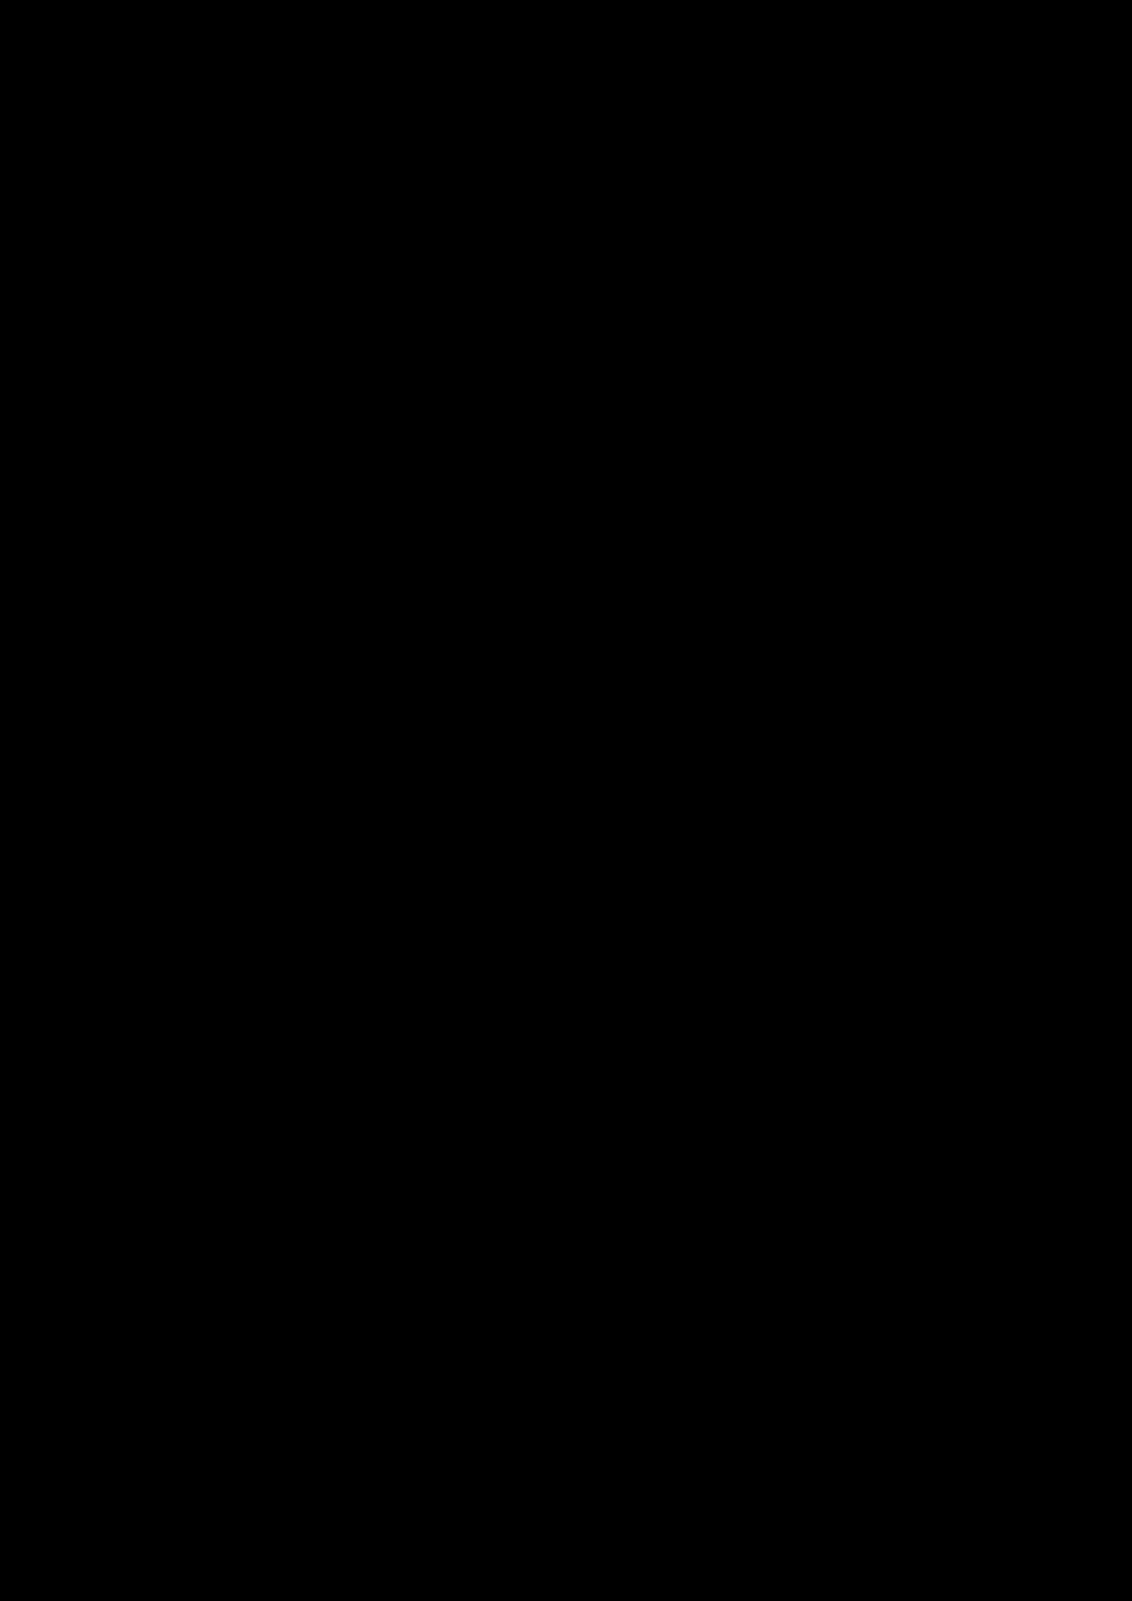 Belyiy sokol slide, Image 91